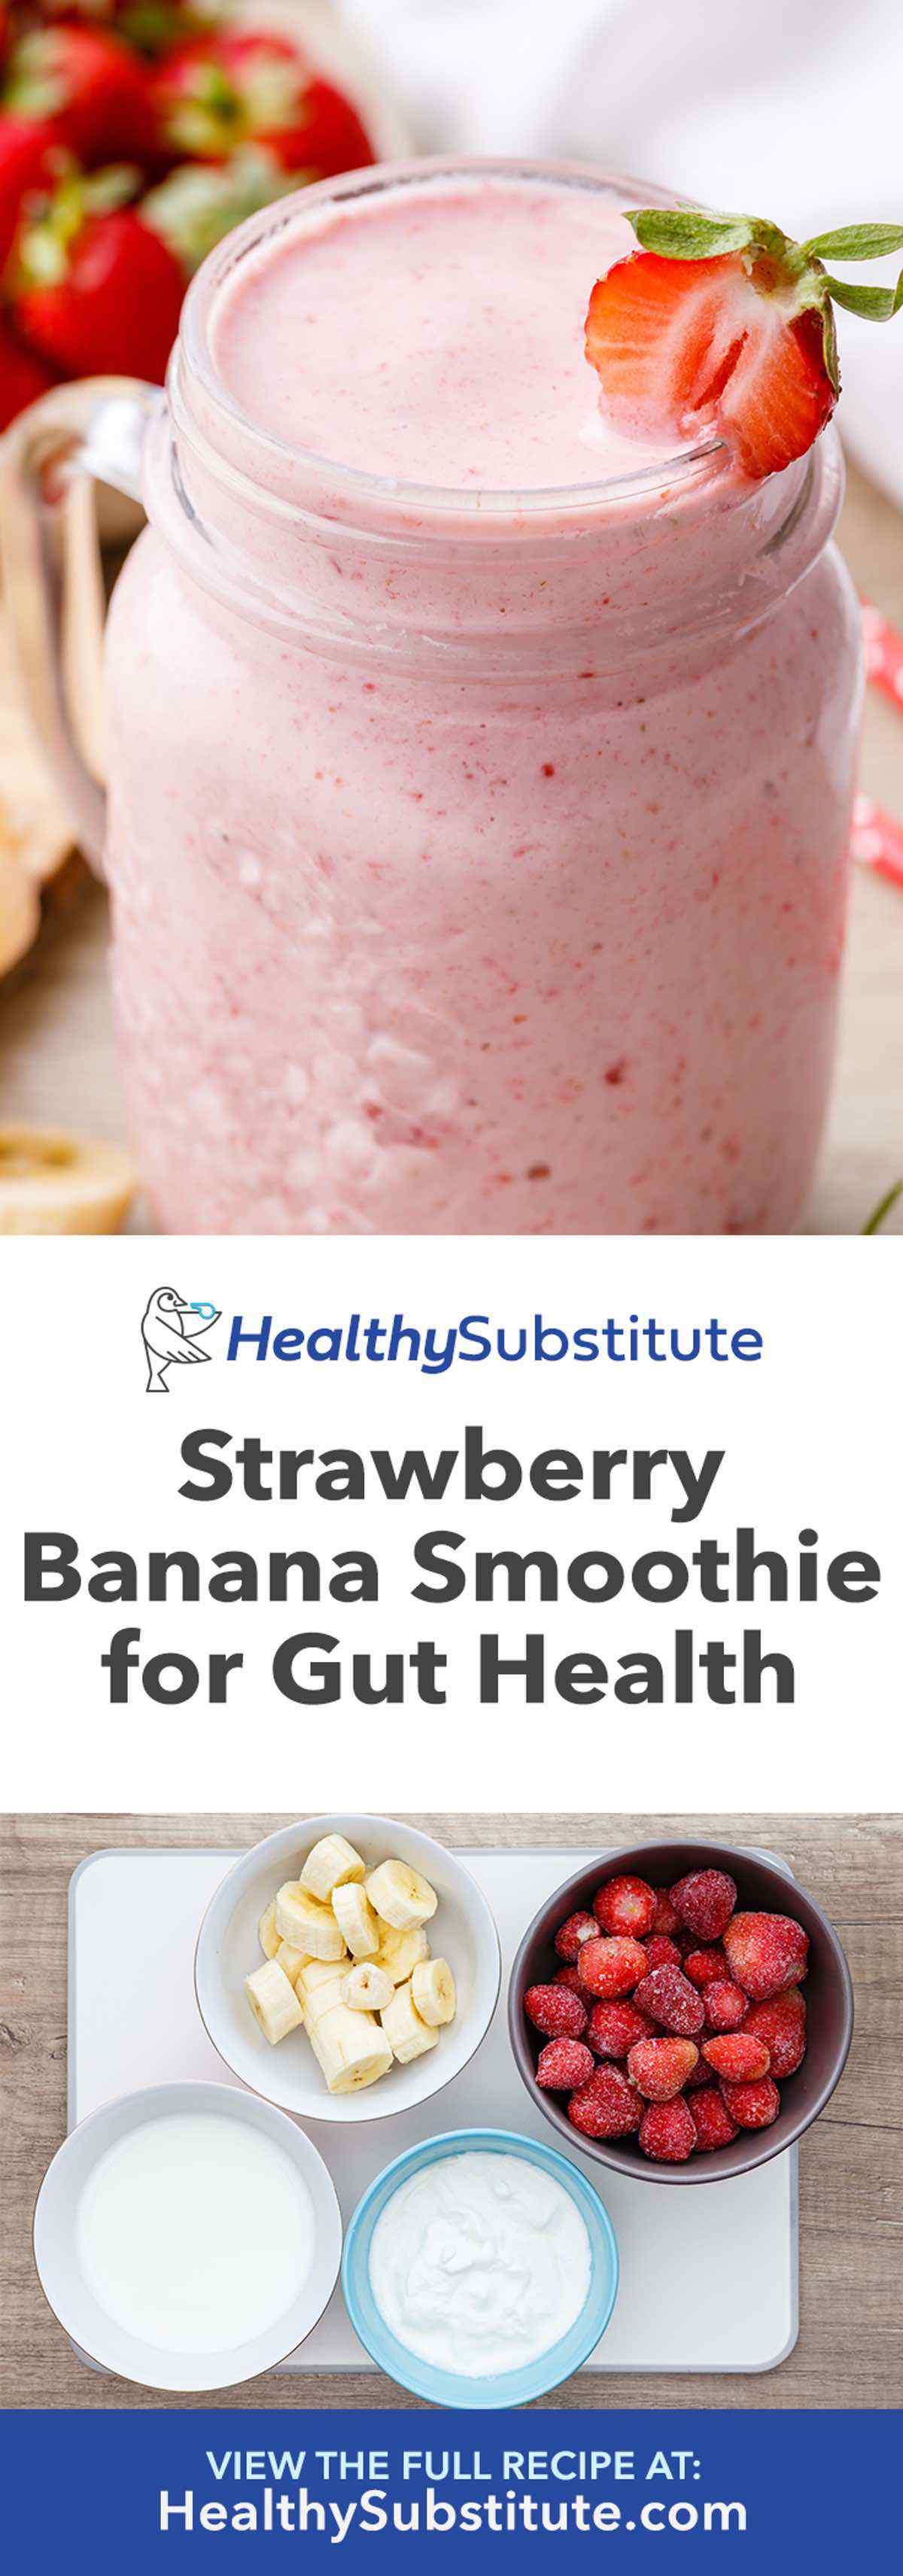 Probiotic-Rich Greek Yogurt Strawberry Banana Smoothie - Healthy Substitute #strawberrybananasmoothie Probiotic-Rich Greek Yogurt Strawberry Banana Smoothie - Healthy Substitute #strawberrybananasmoothie